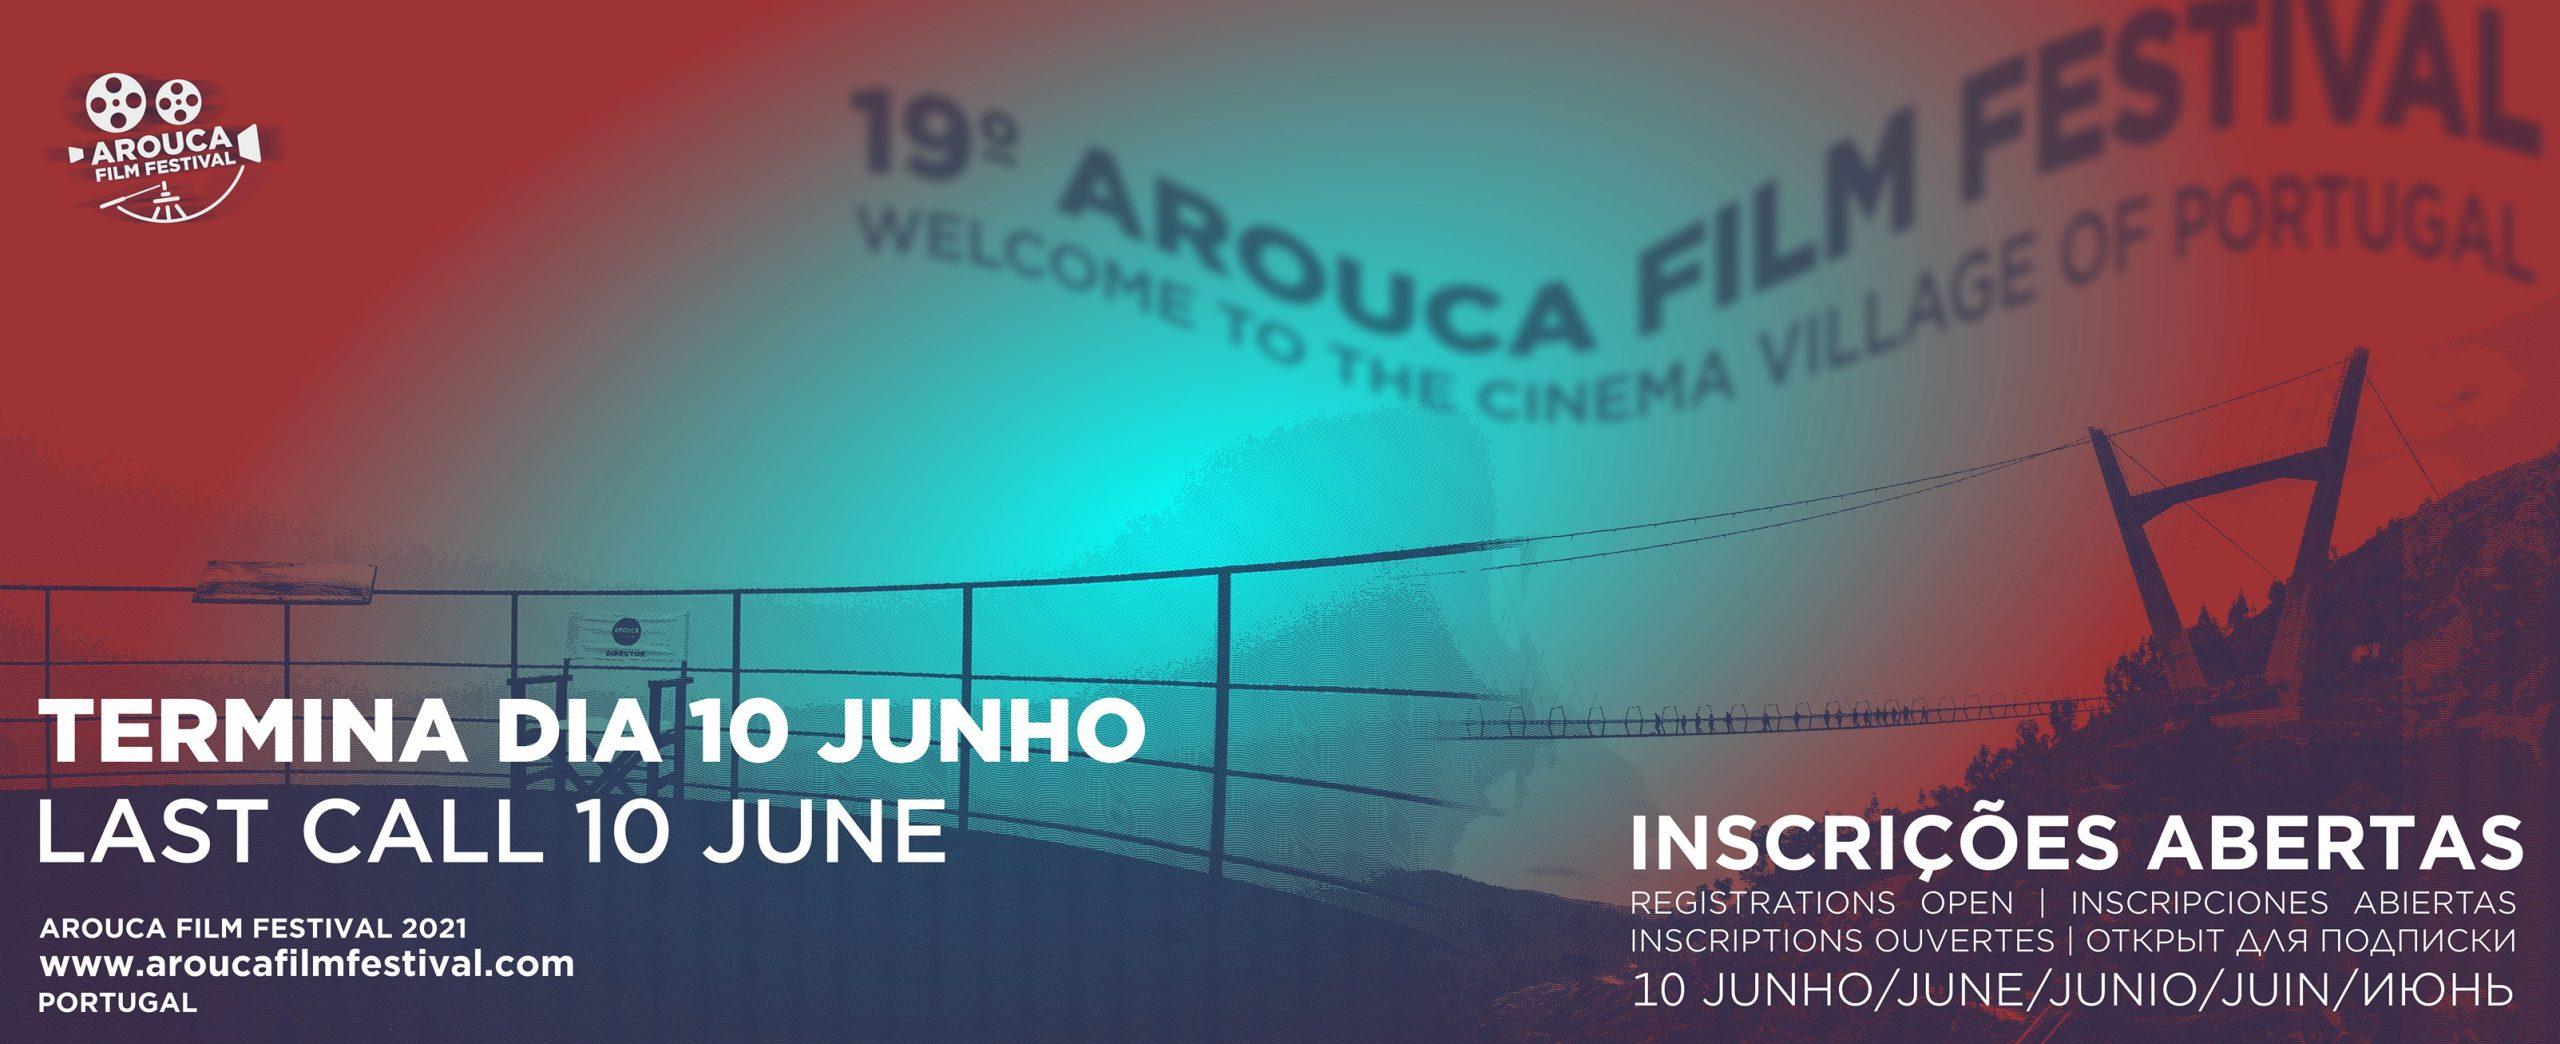 Last Call for Entries: Arouca Film Festival